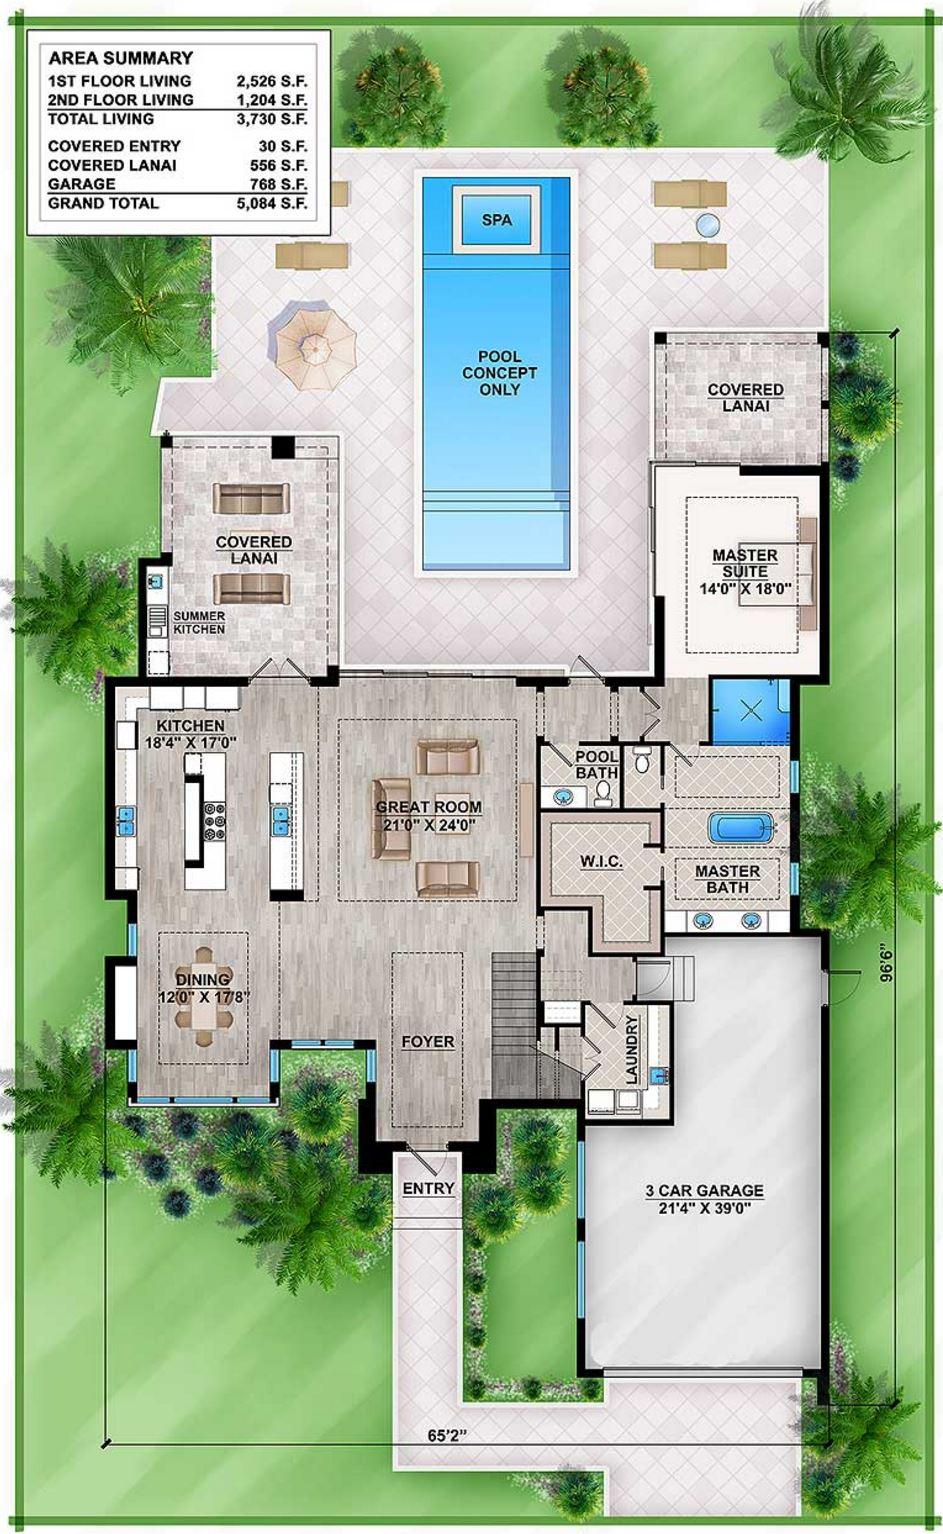 Planos de casas modernas planos de casas gratis y modernas for Planos de casas con piscina